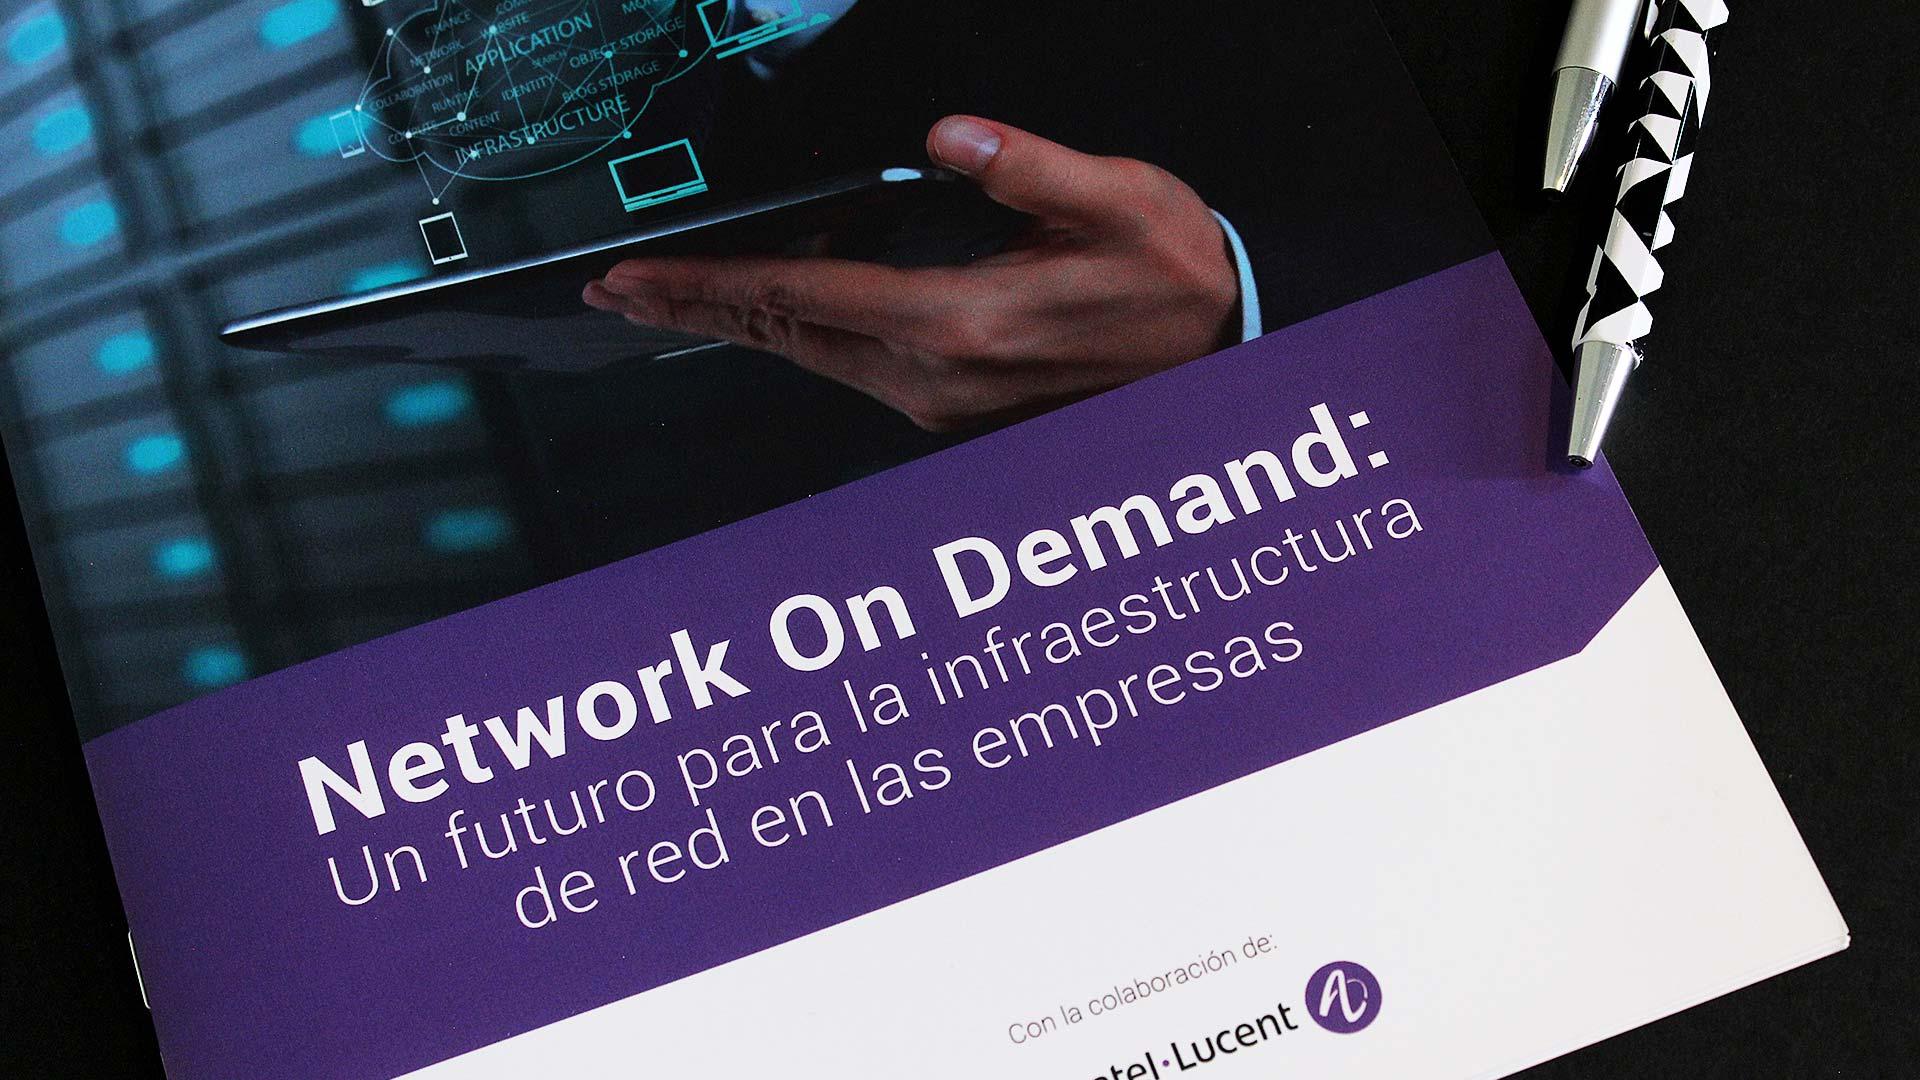 alcatel-content-marketing-informe-resumen-ejecutivo-networkondemand-ebook-2016-07